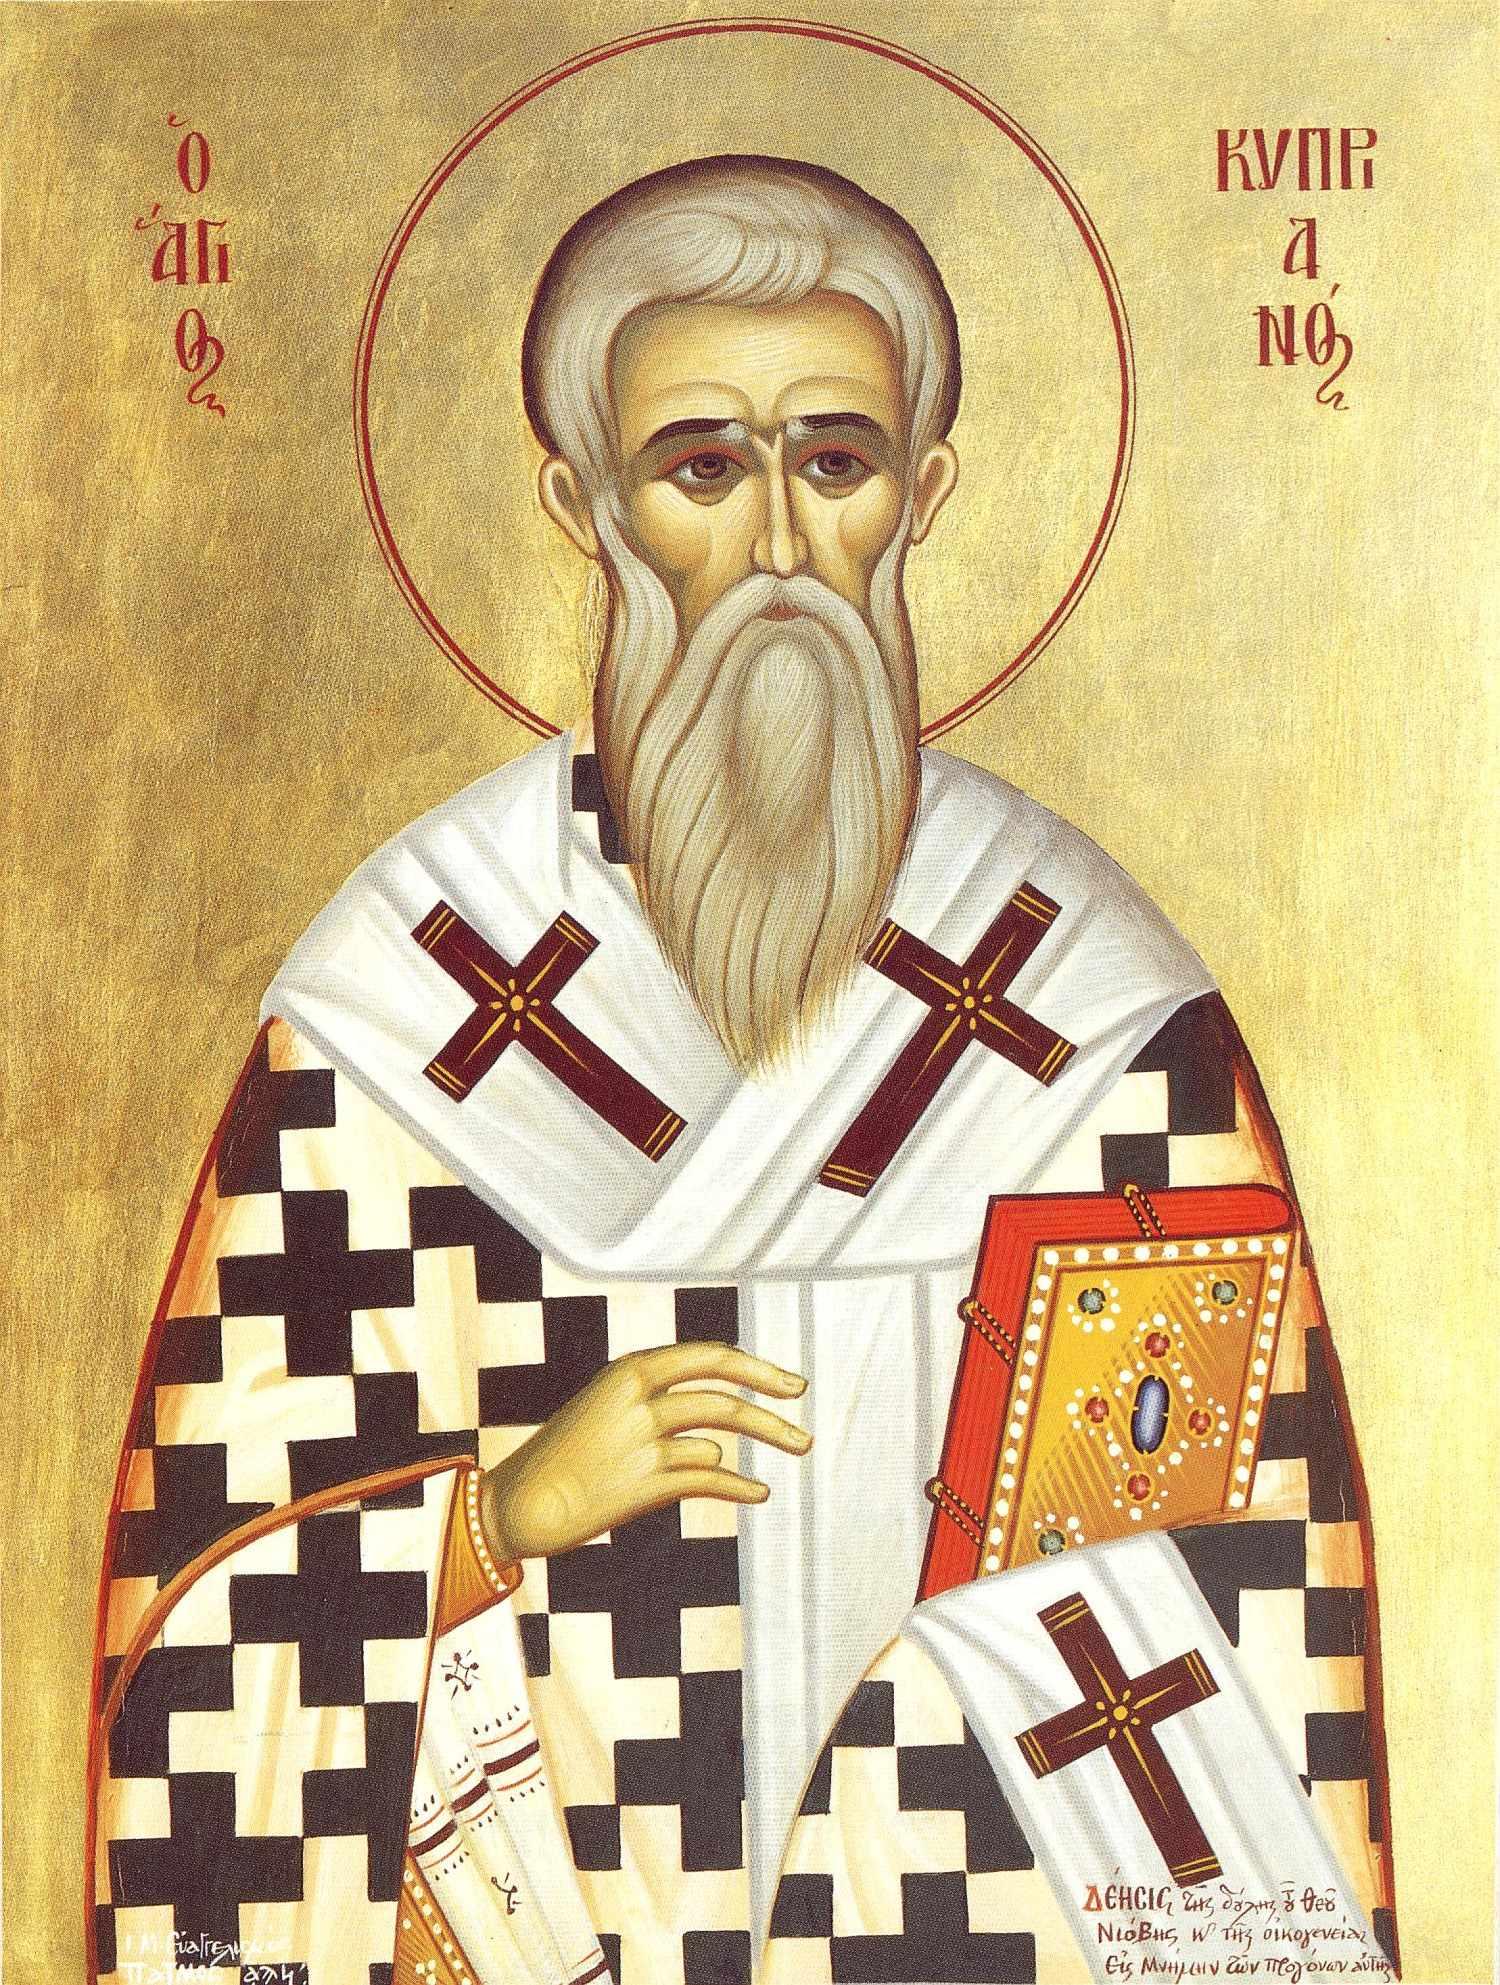 икона Святого Киприяна